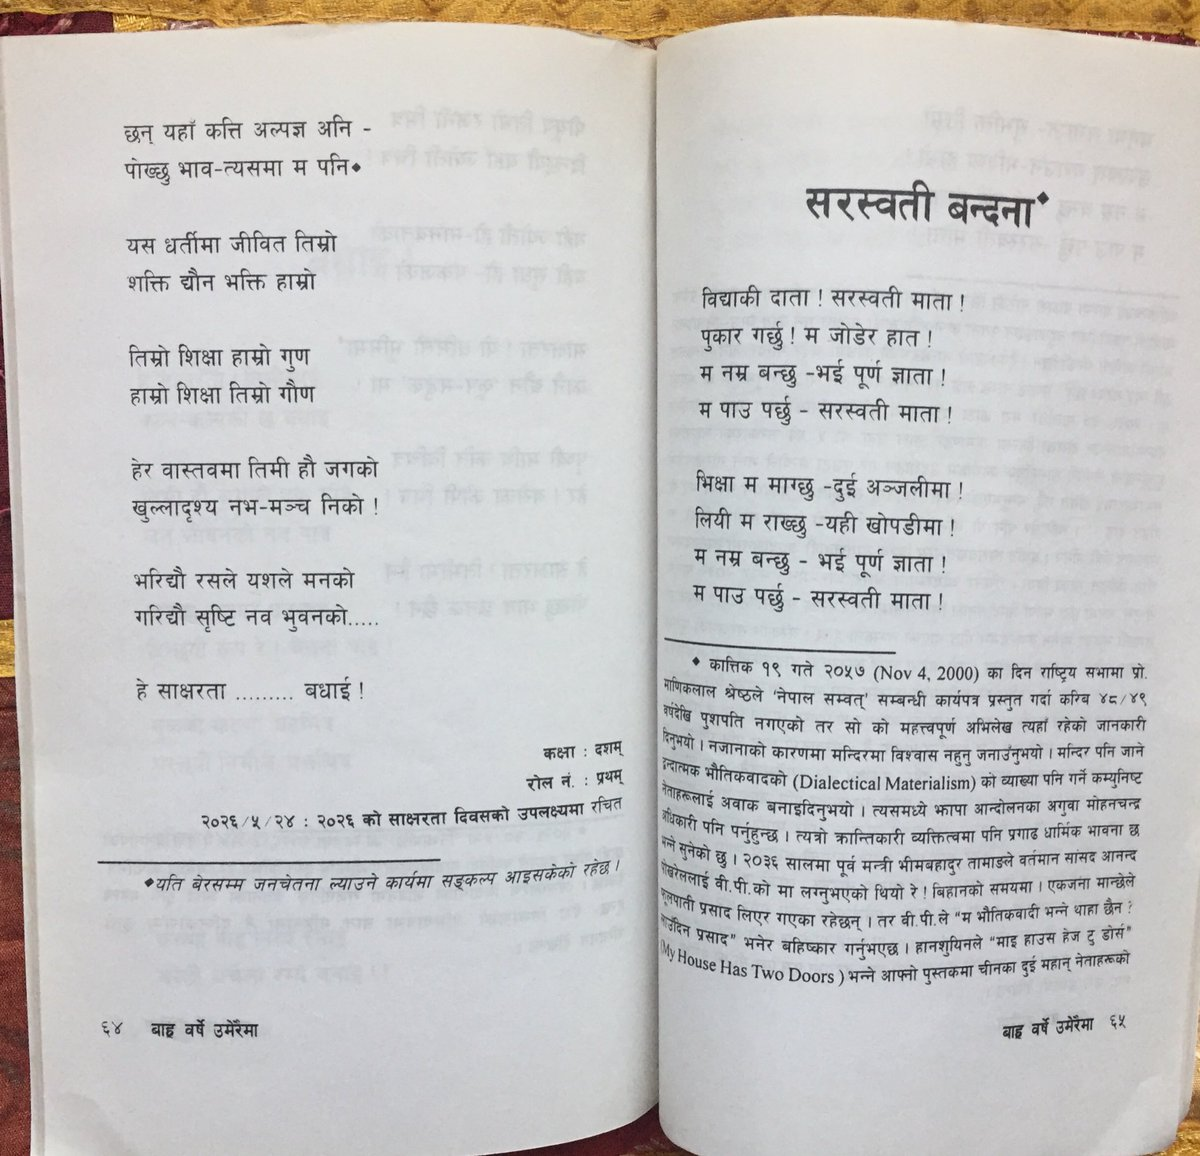 #SaveHimalayanCivilization!Happy😃 #SaraswatiPooja! #VasantaPanchami! #VasantaSrawan! Day of Enlightenment! #SaraswatiVandana-I composed in 1970/2026.9.6VS for preparation of SLC Final Test!#PoetAsia-#DrBishnuHariNepal's Book 📚 #AtatheAgeOfTwelve pp.67-69 #Nepal-#Himalayas@#UNSG